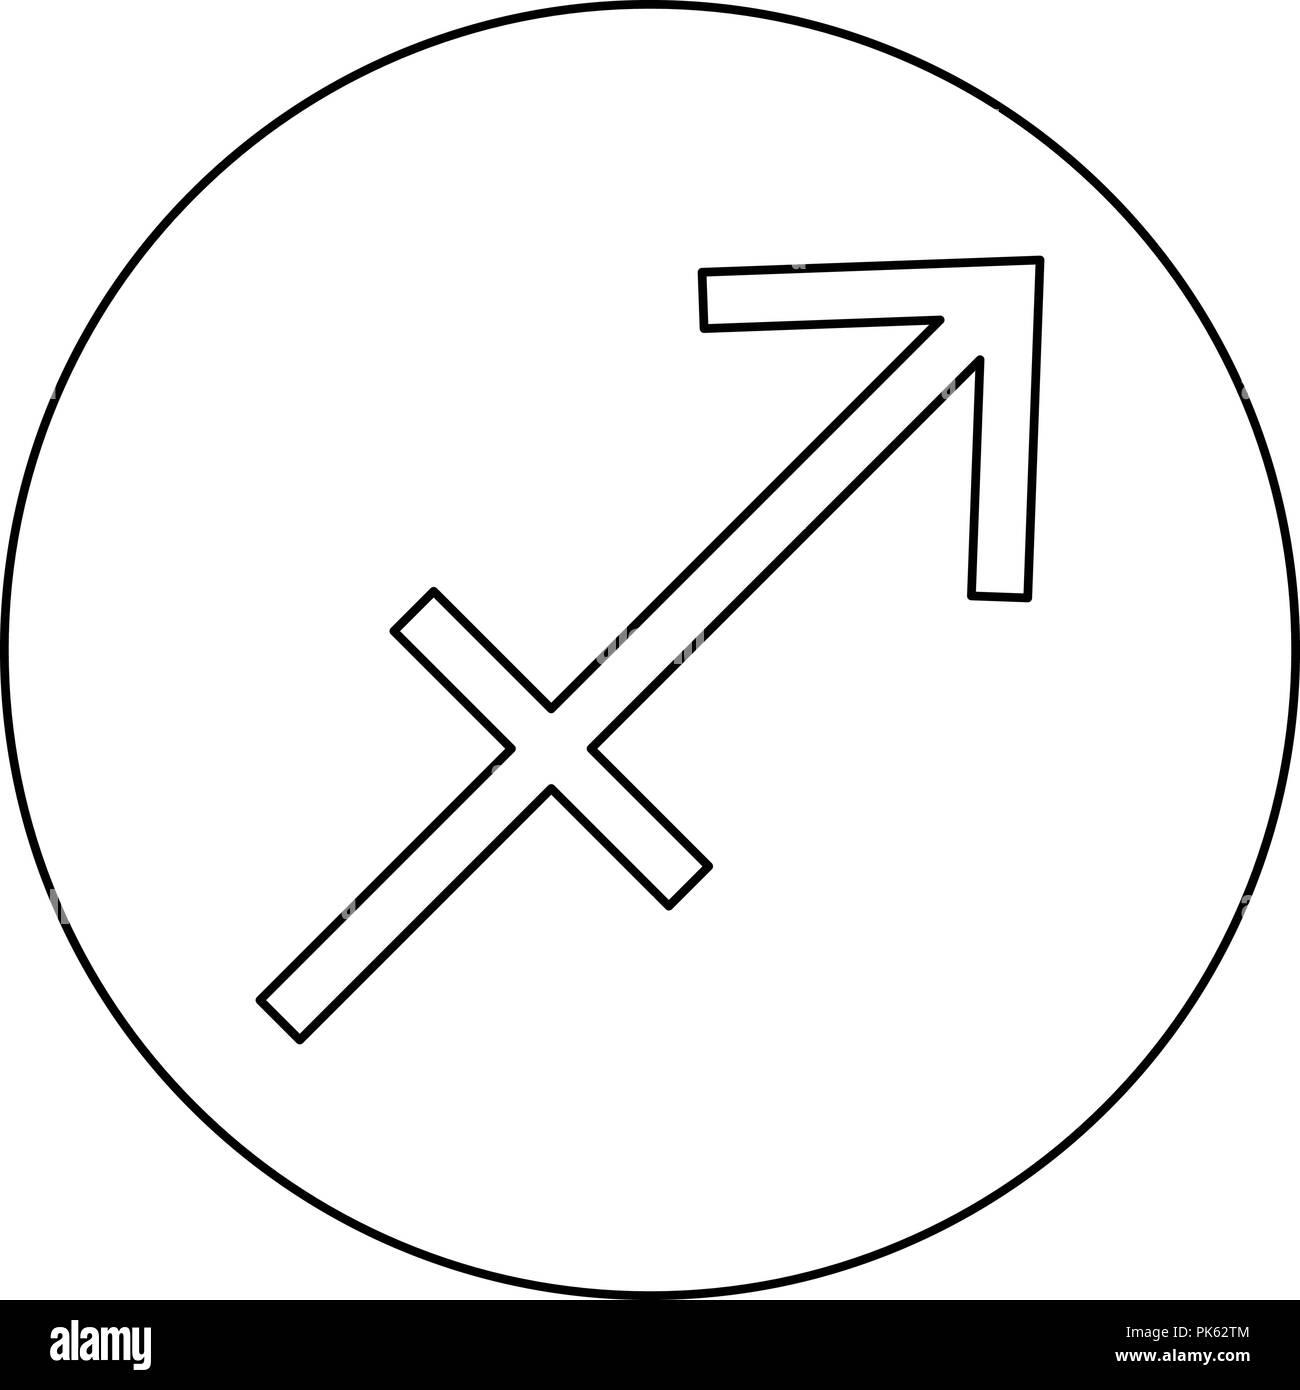 Sagittarius symbol zodiac icon black color in round circle outline vector I Stock Vector